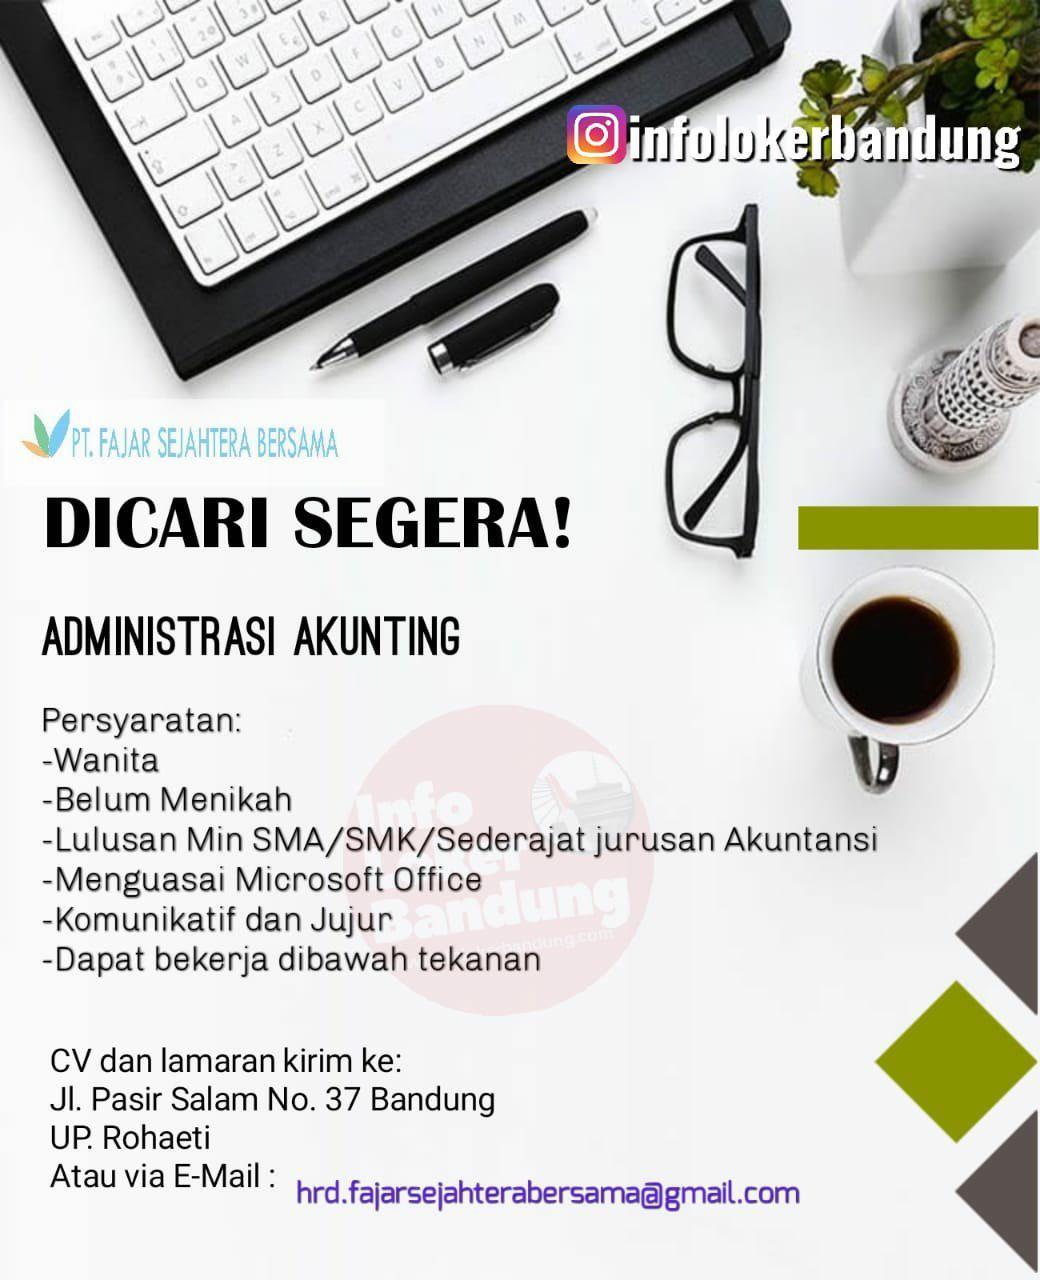 Lowongan Kerja PT. Fajar Sejahtera Bersama Bandung September 2019